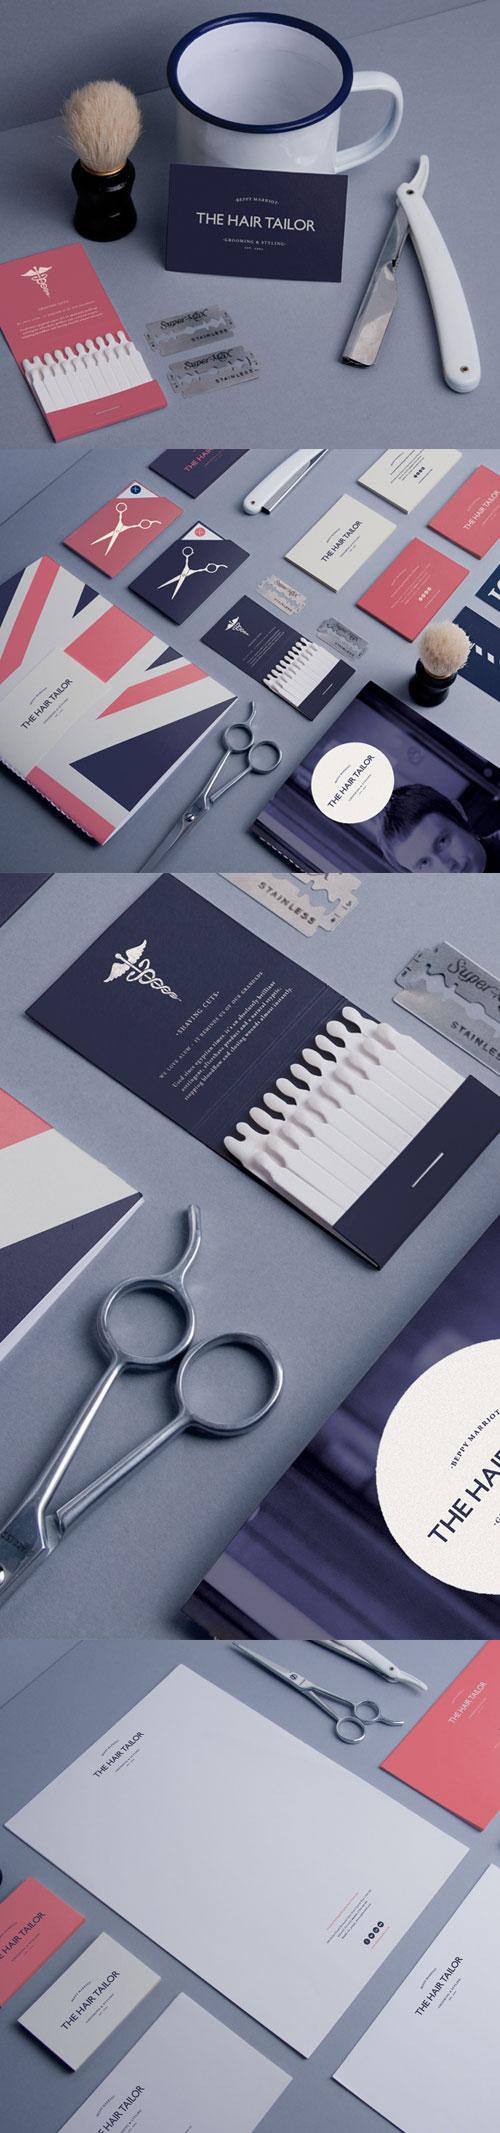 corporate_identity_design_7